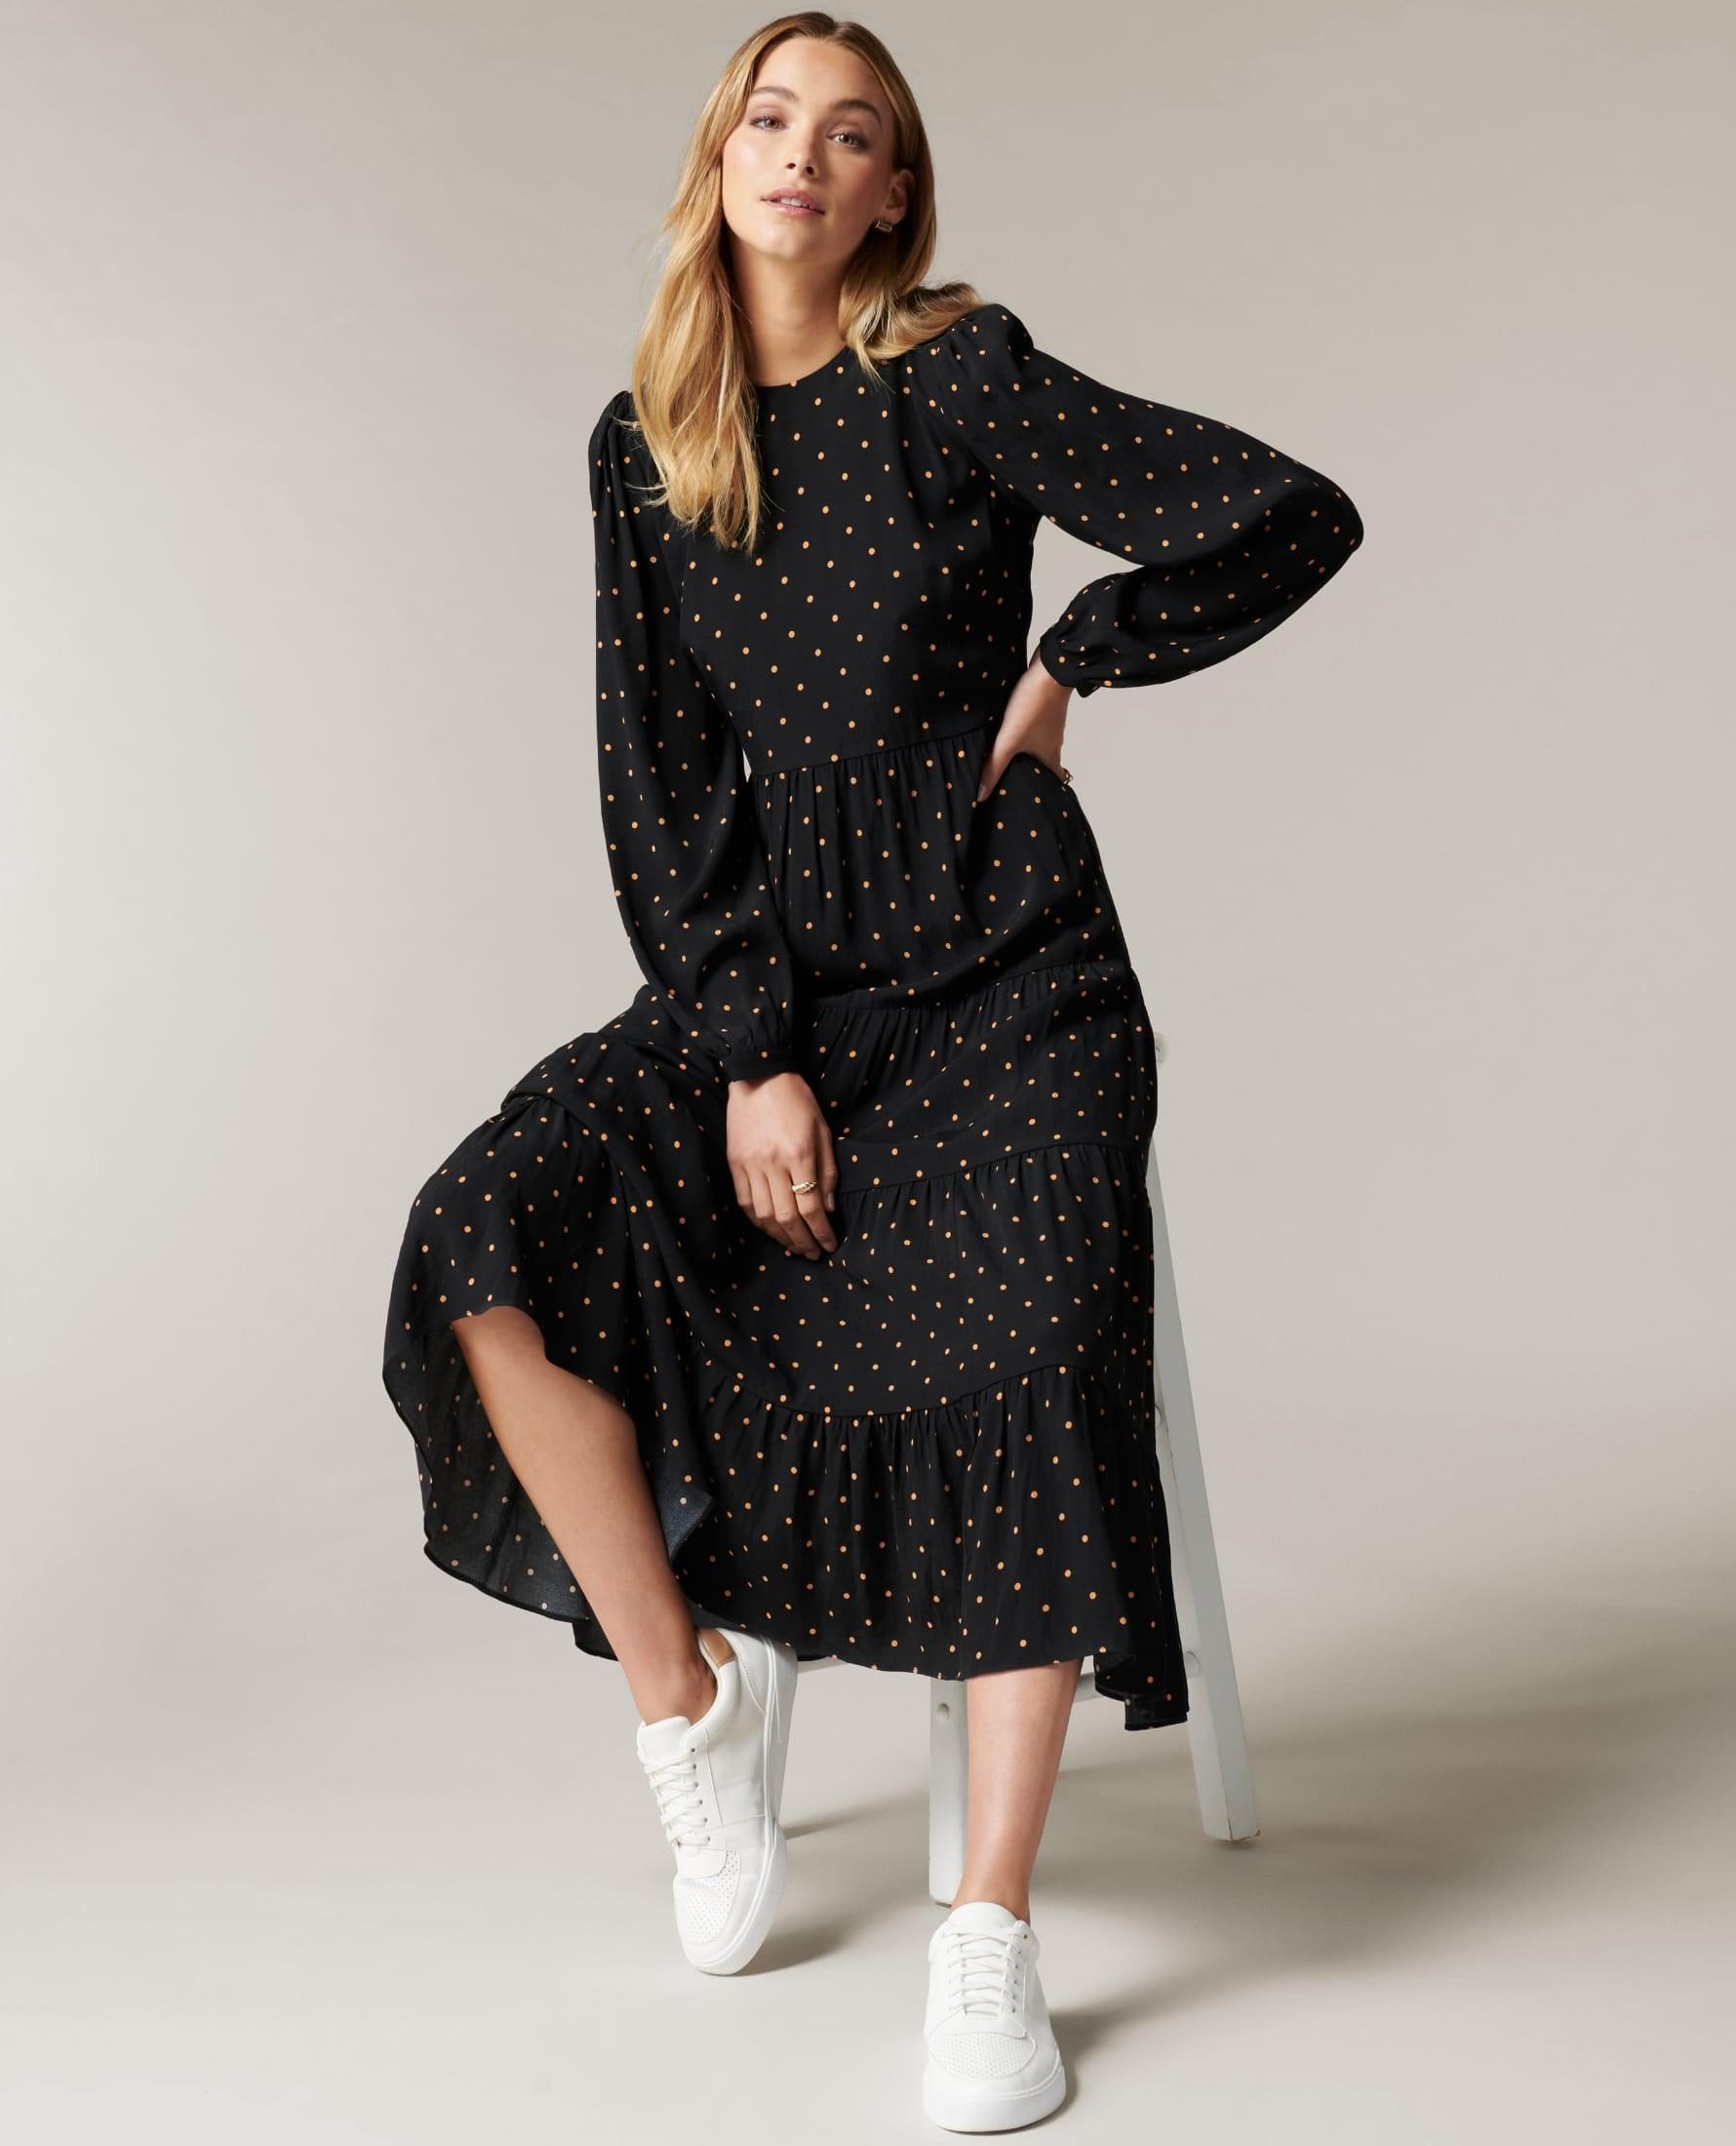 Forever New Women's Fashion Dresses